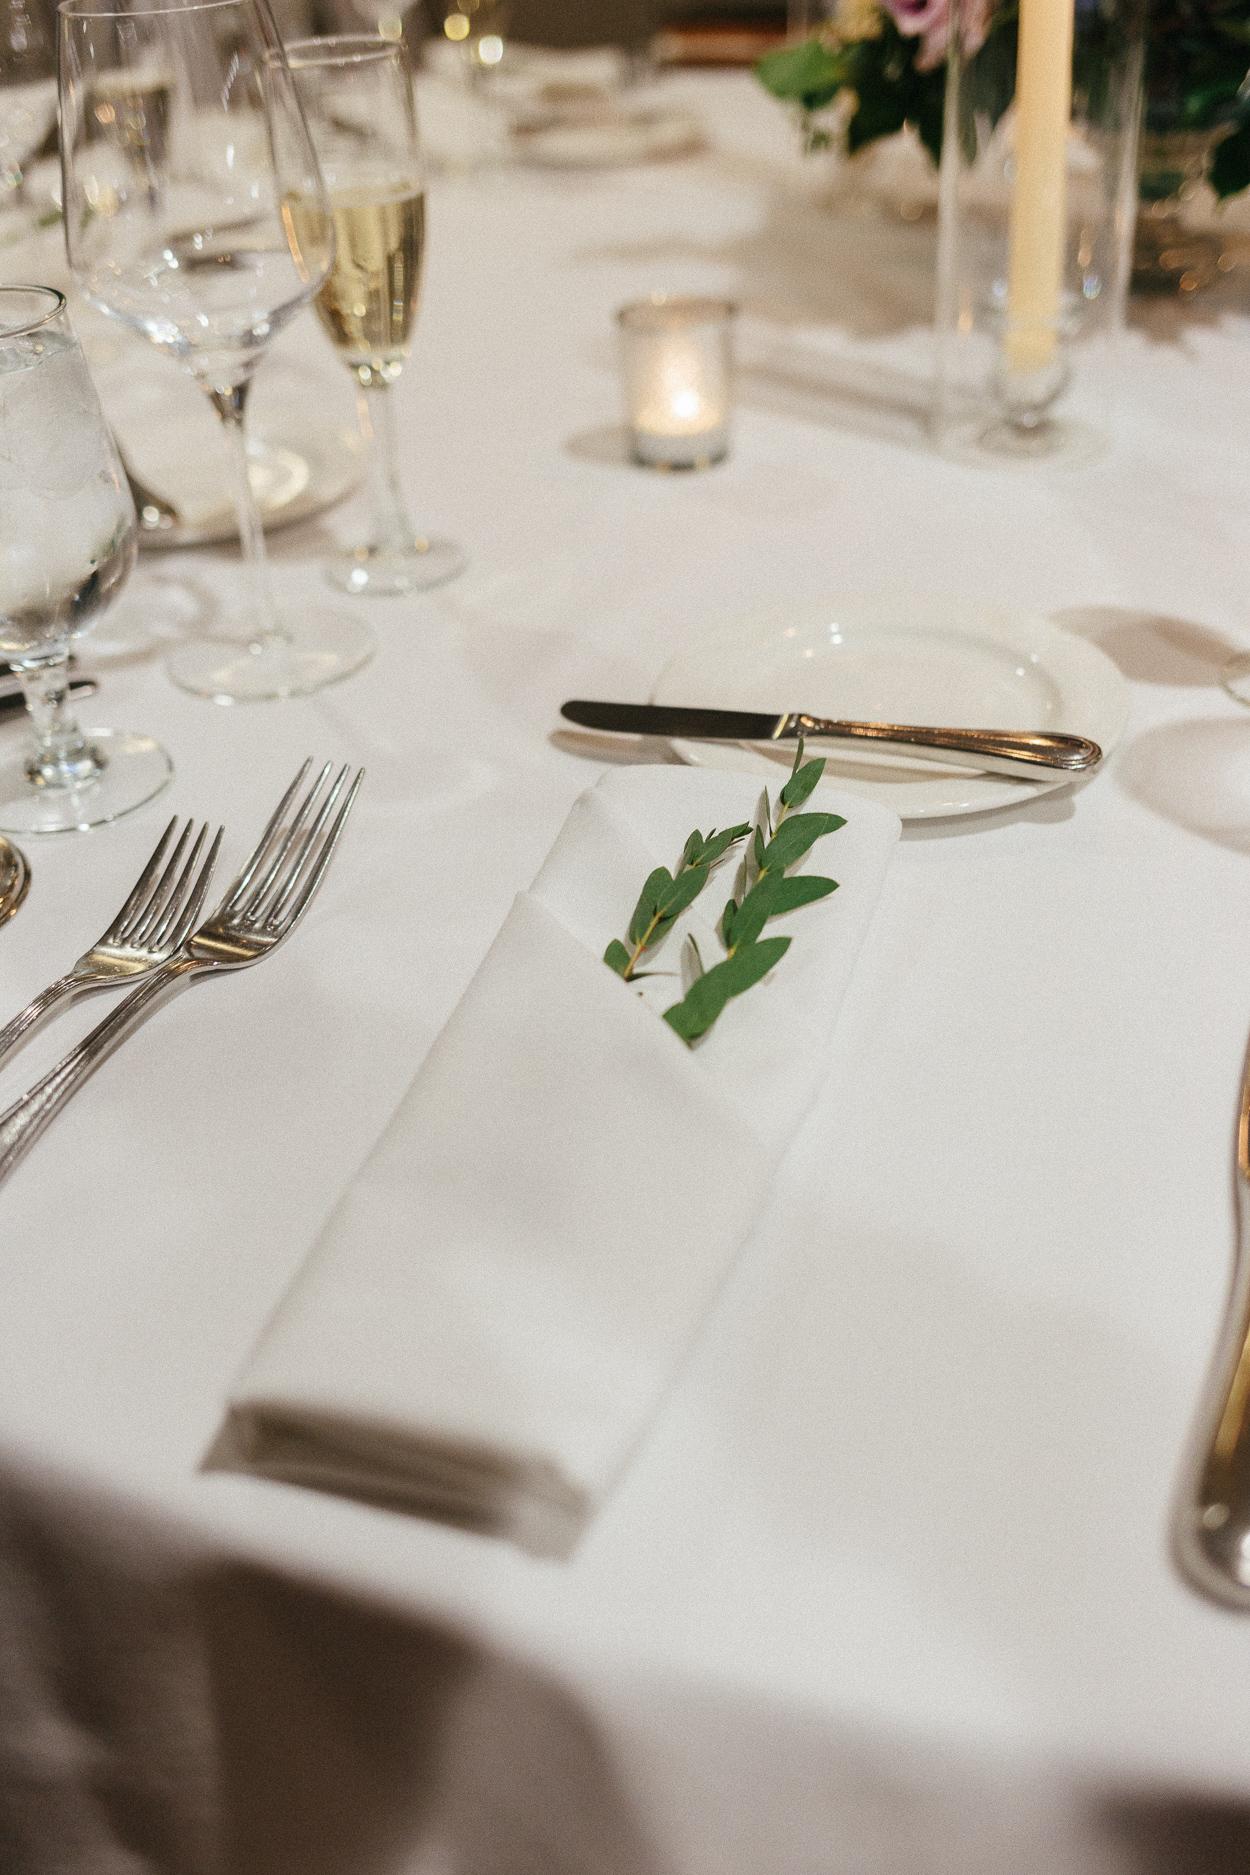 tower-club-wedding-reception-place-setting-greenery